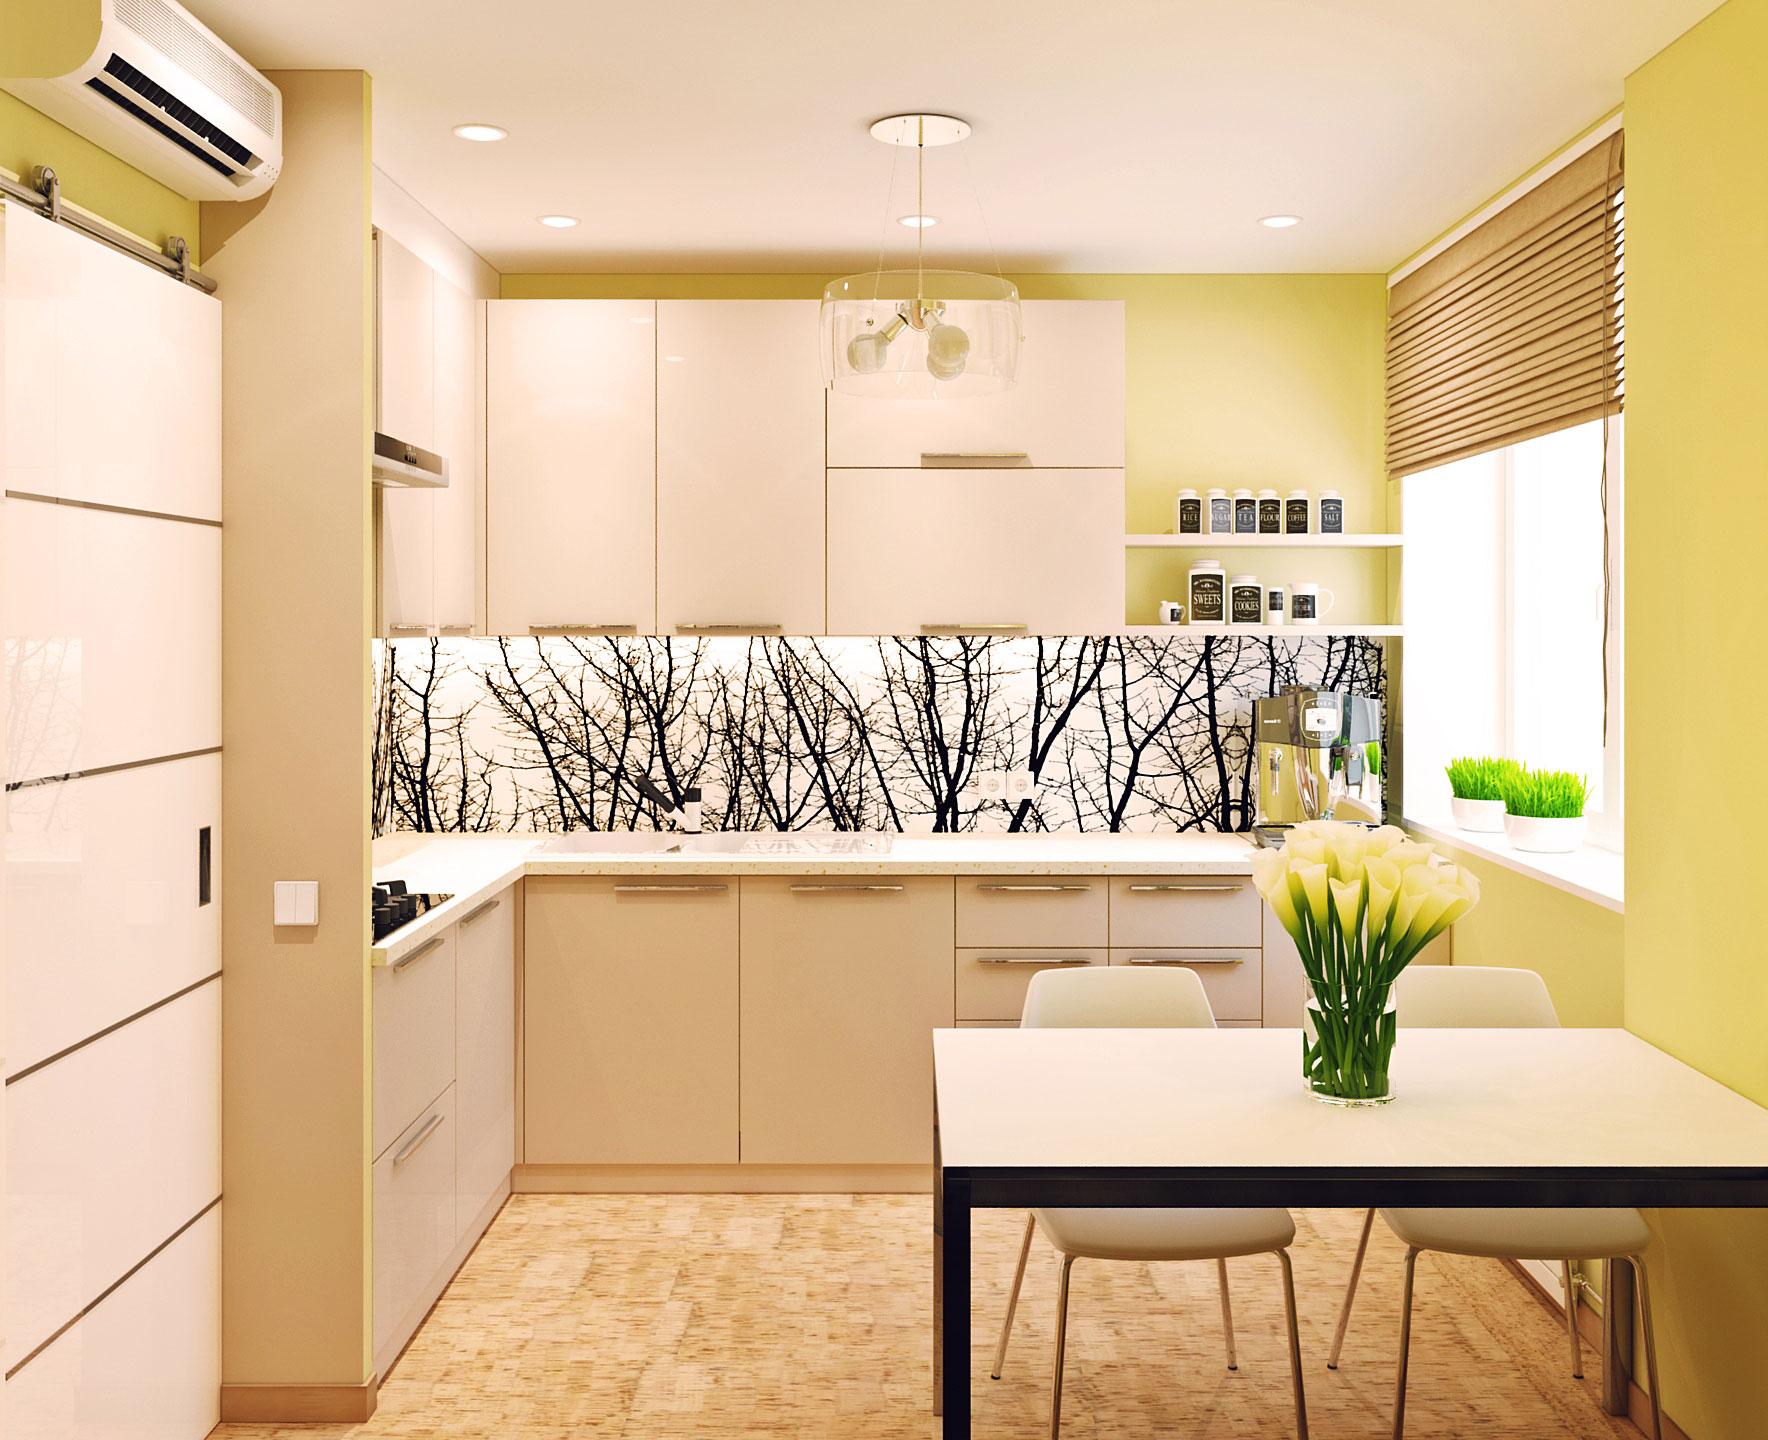 Квартира 53 кв м дизайн интерьера